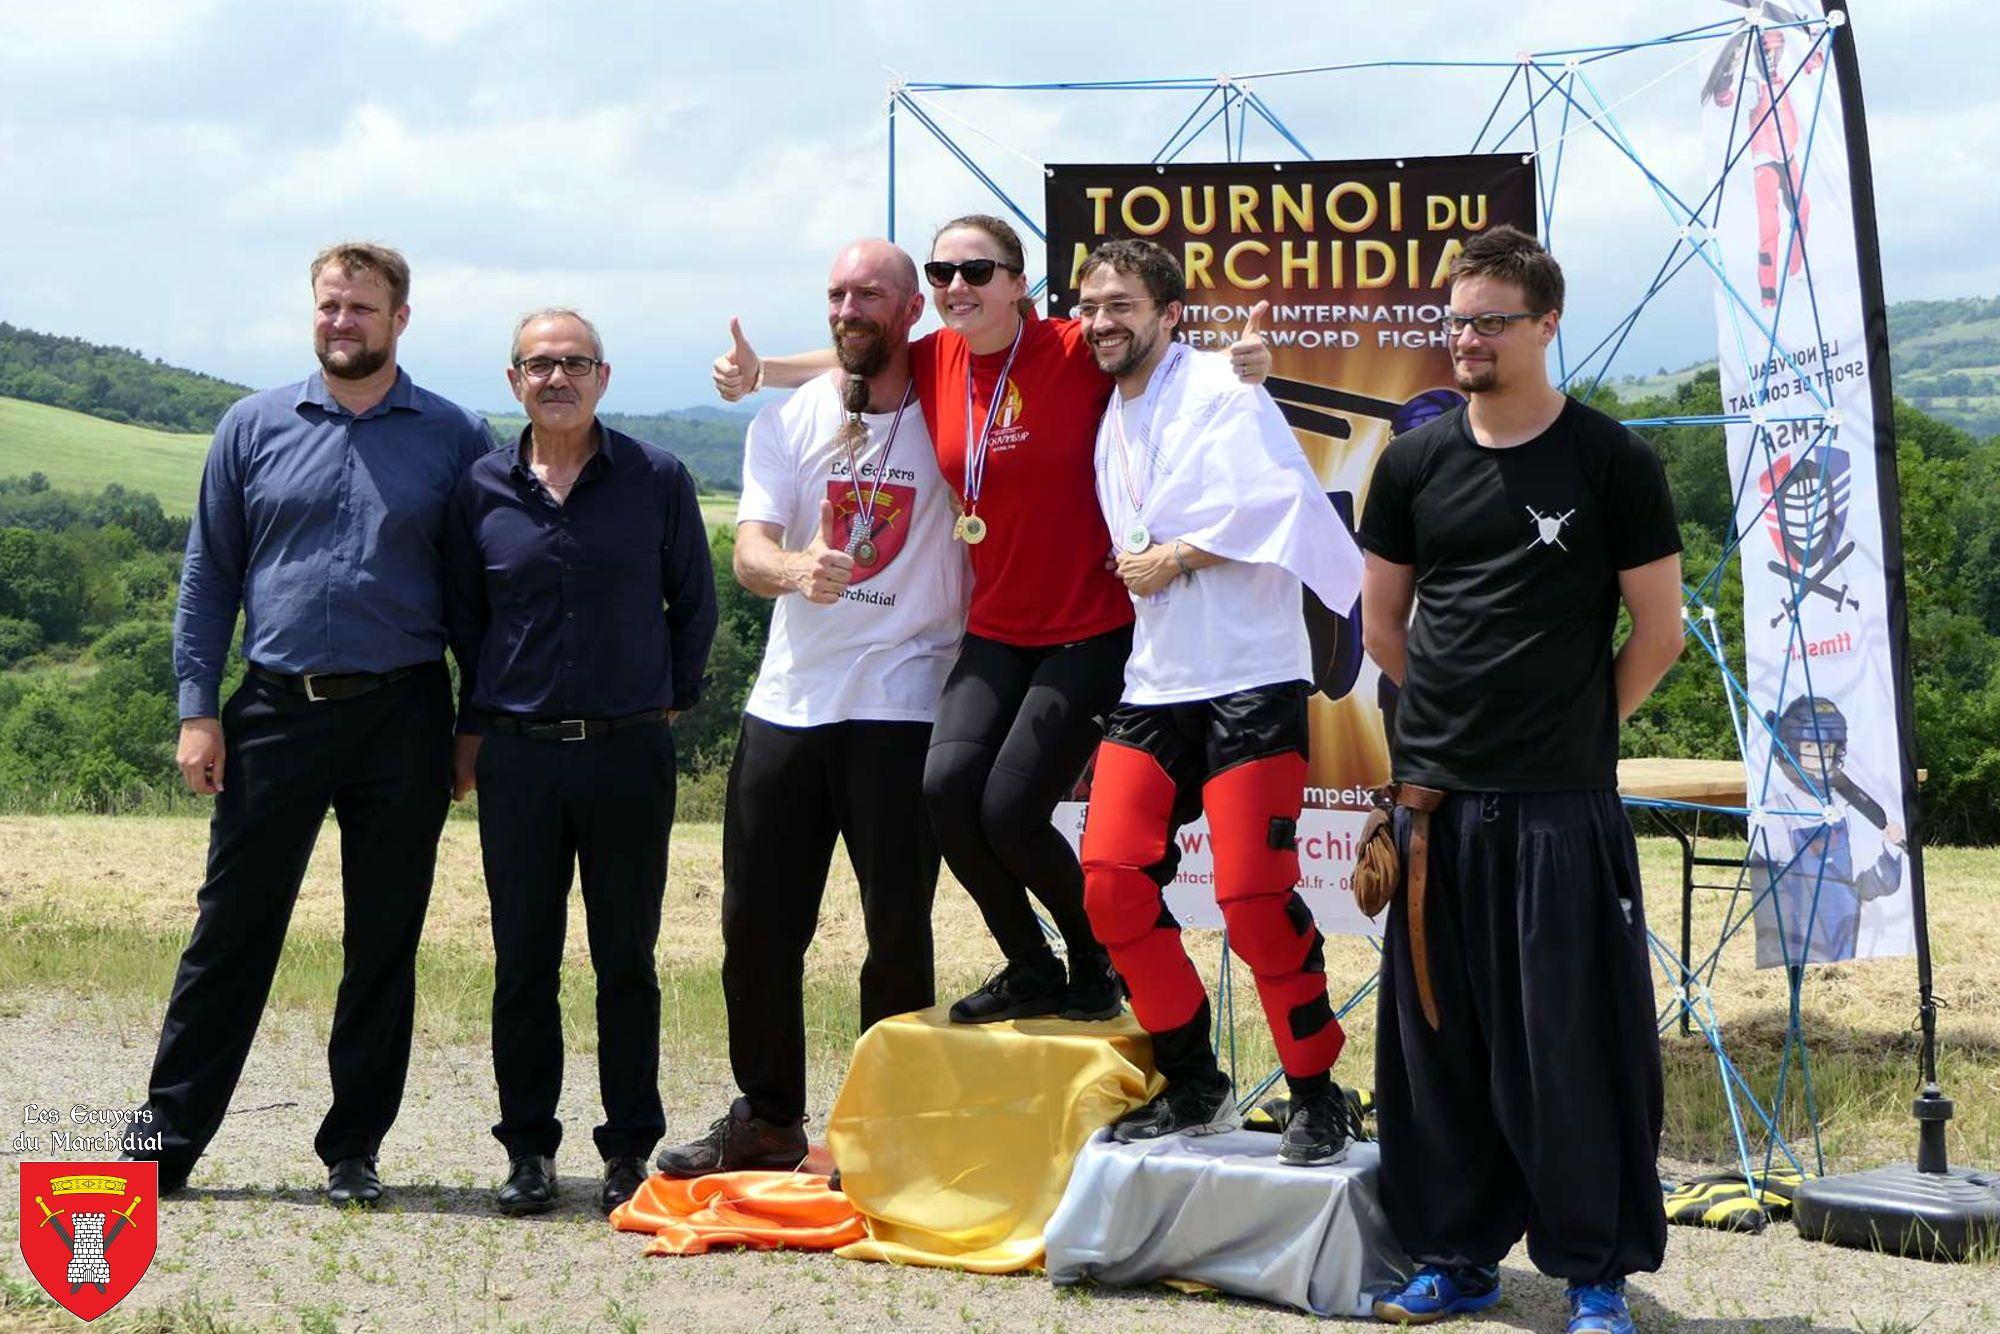 18-06-10_podium_senior2_epee2mains-marchidial.fr